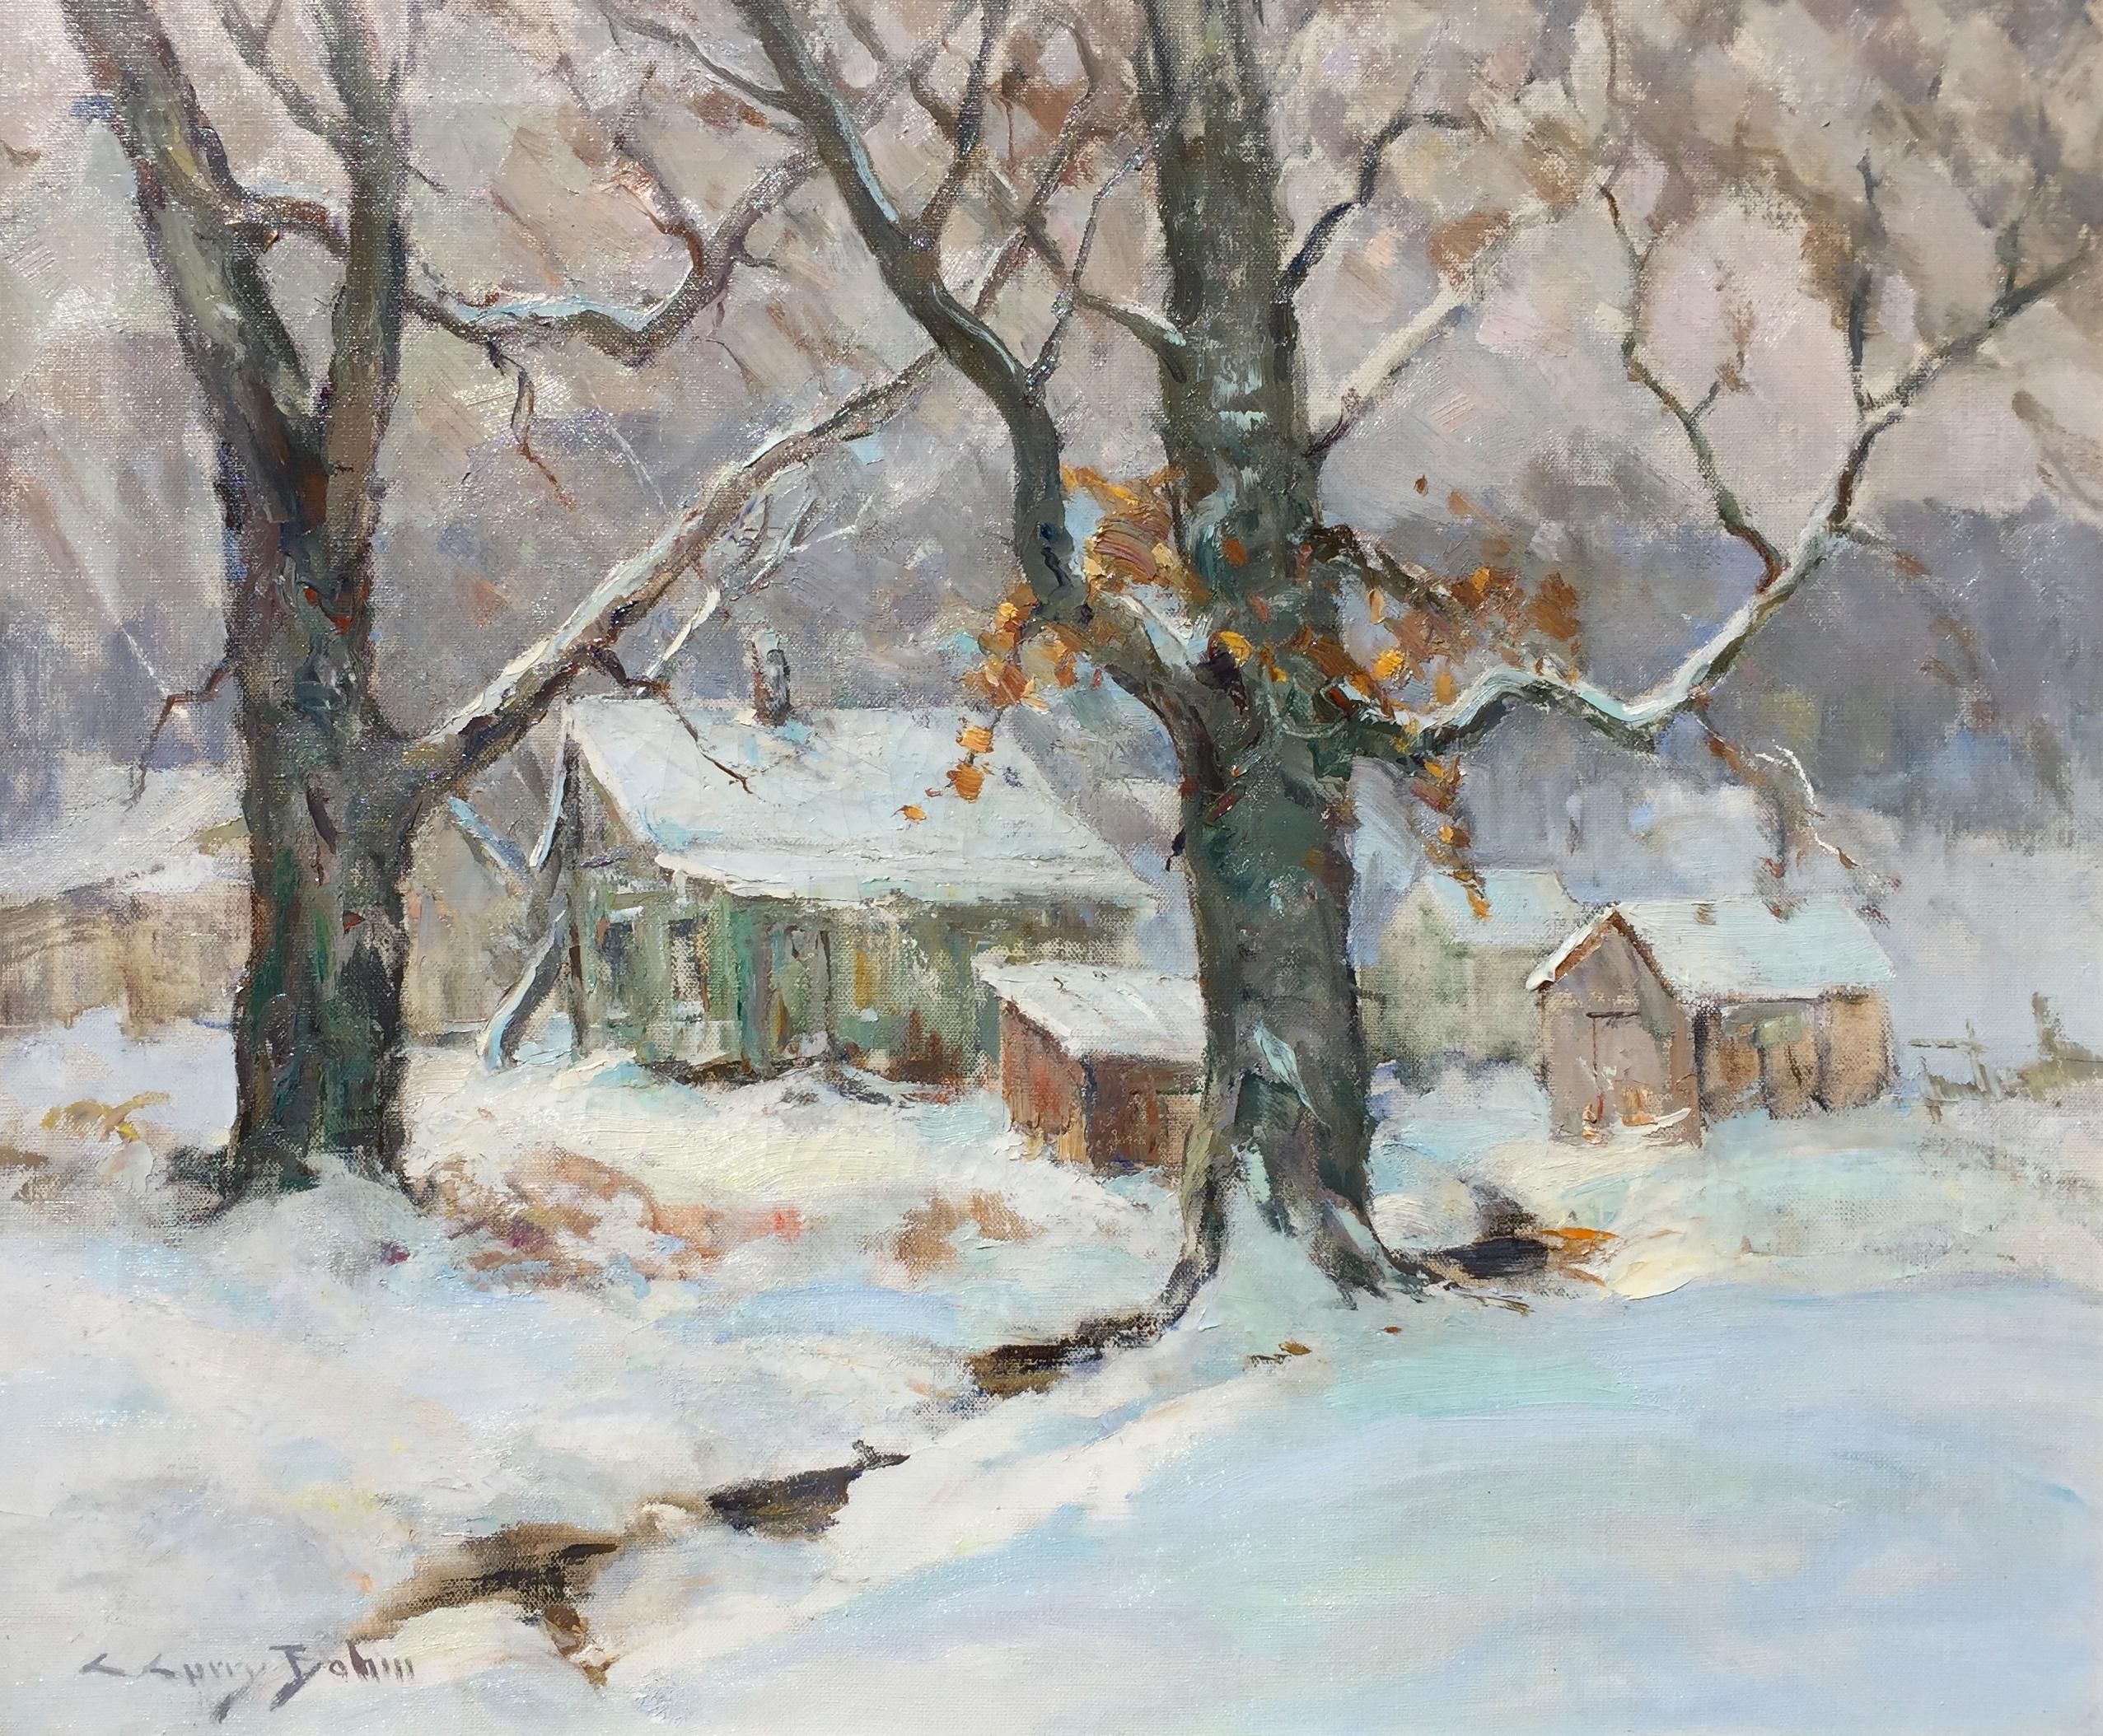 Winter in Nashville